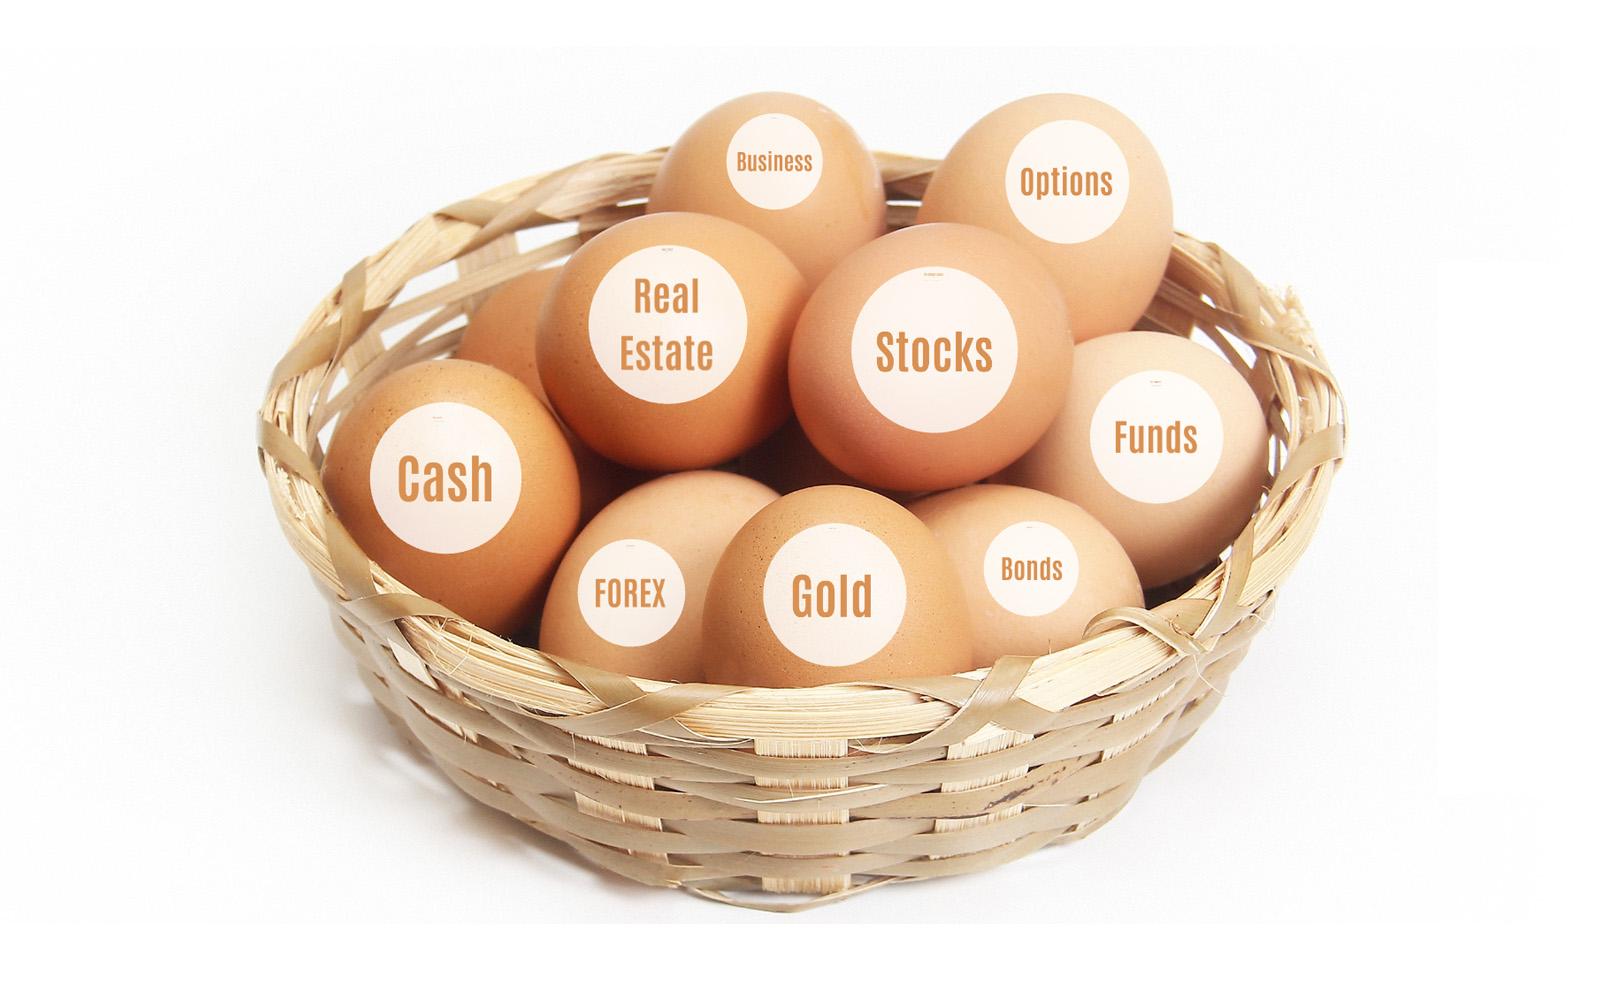 Investing Prezi template eggs in one basket rule